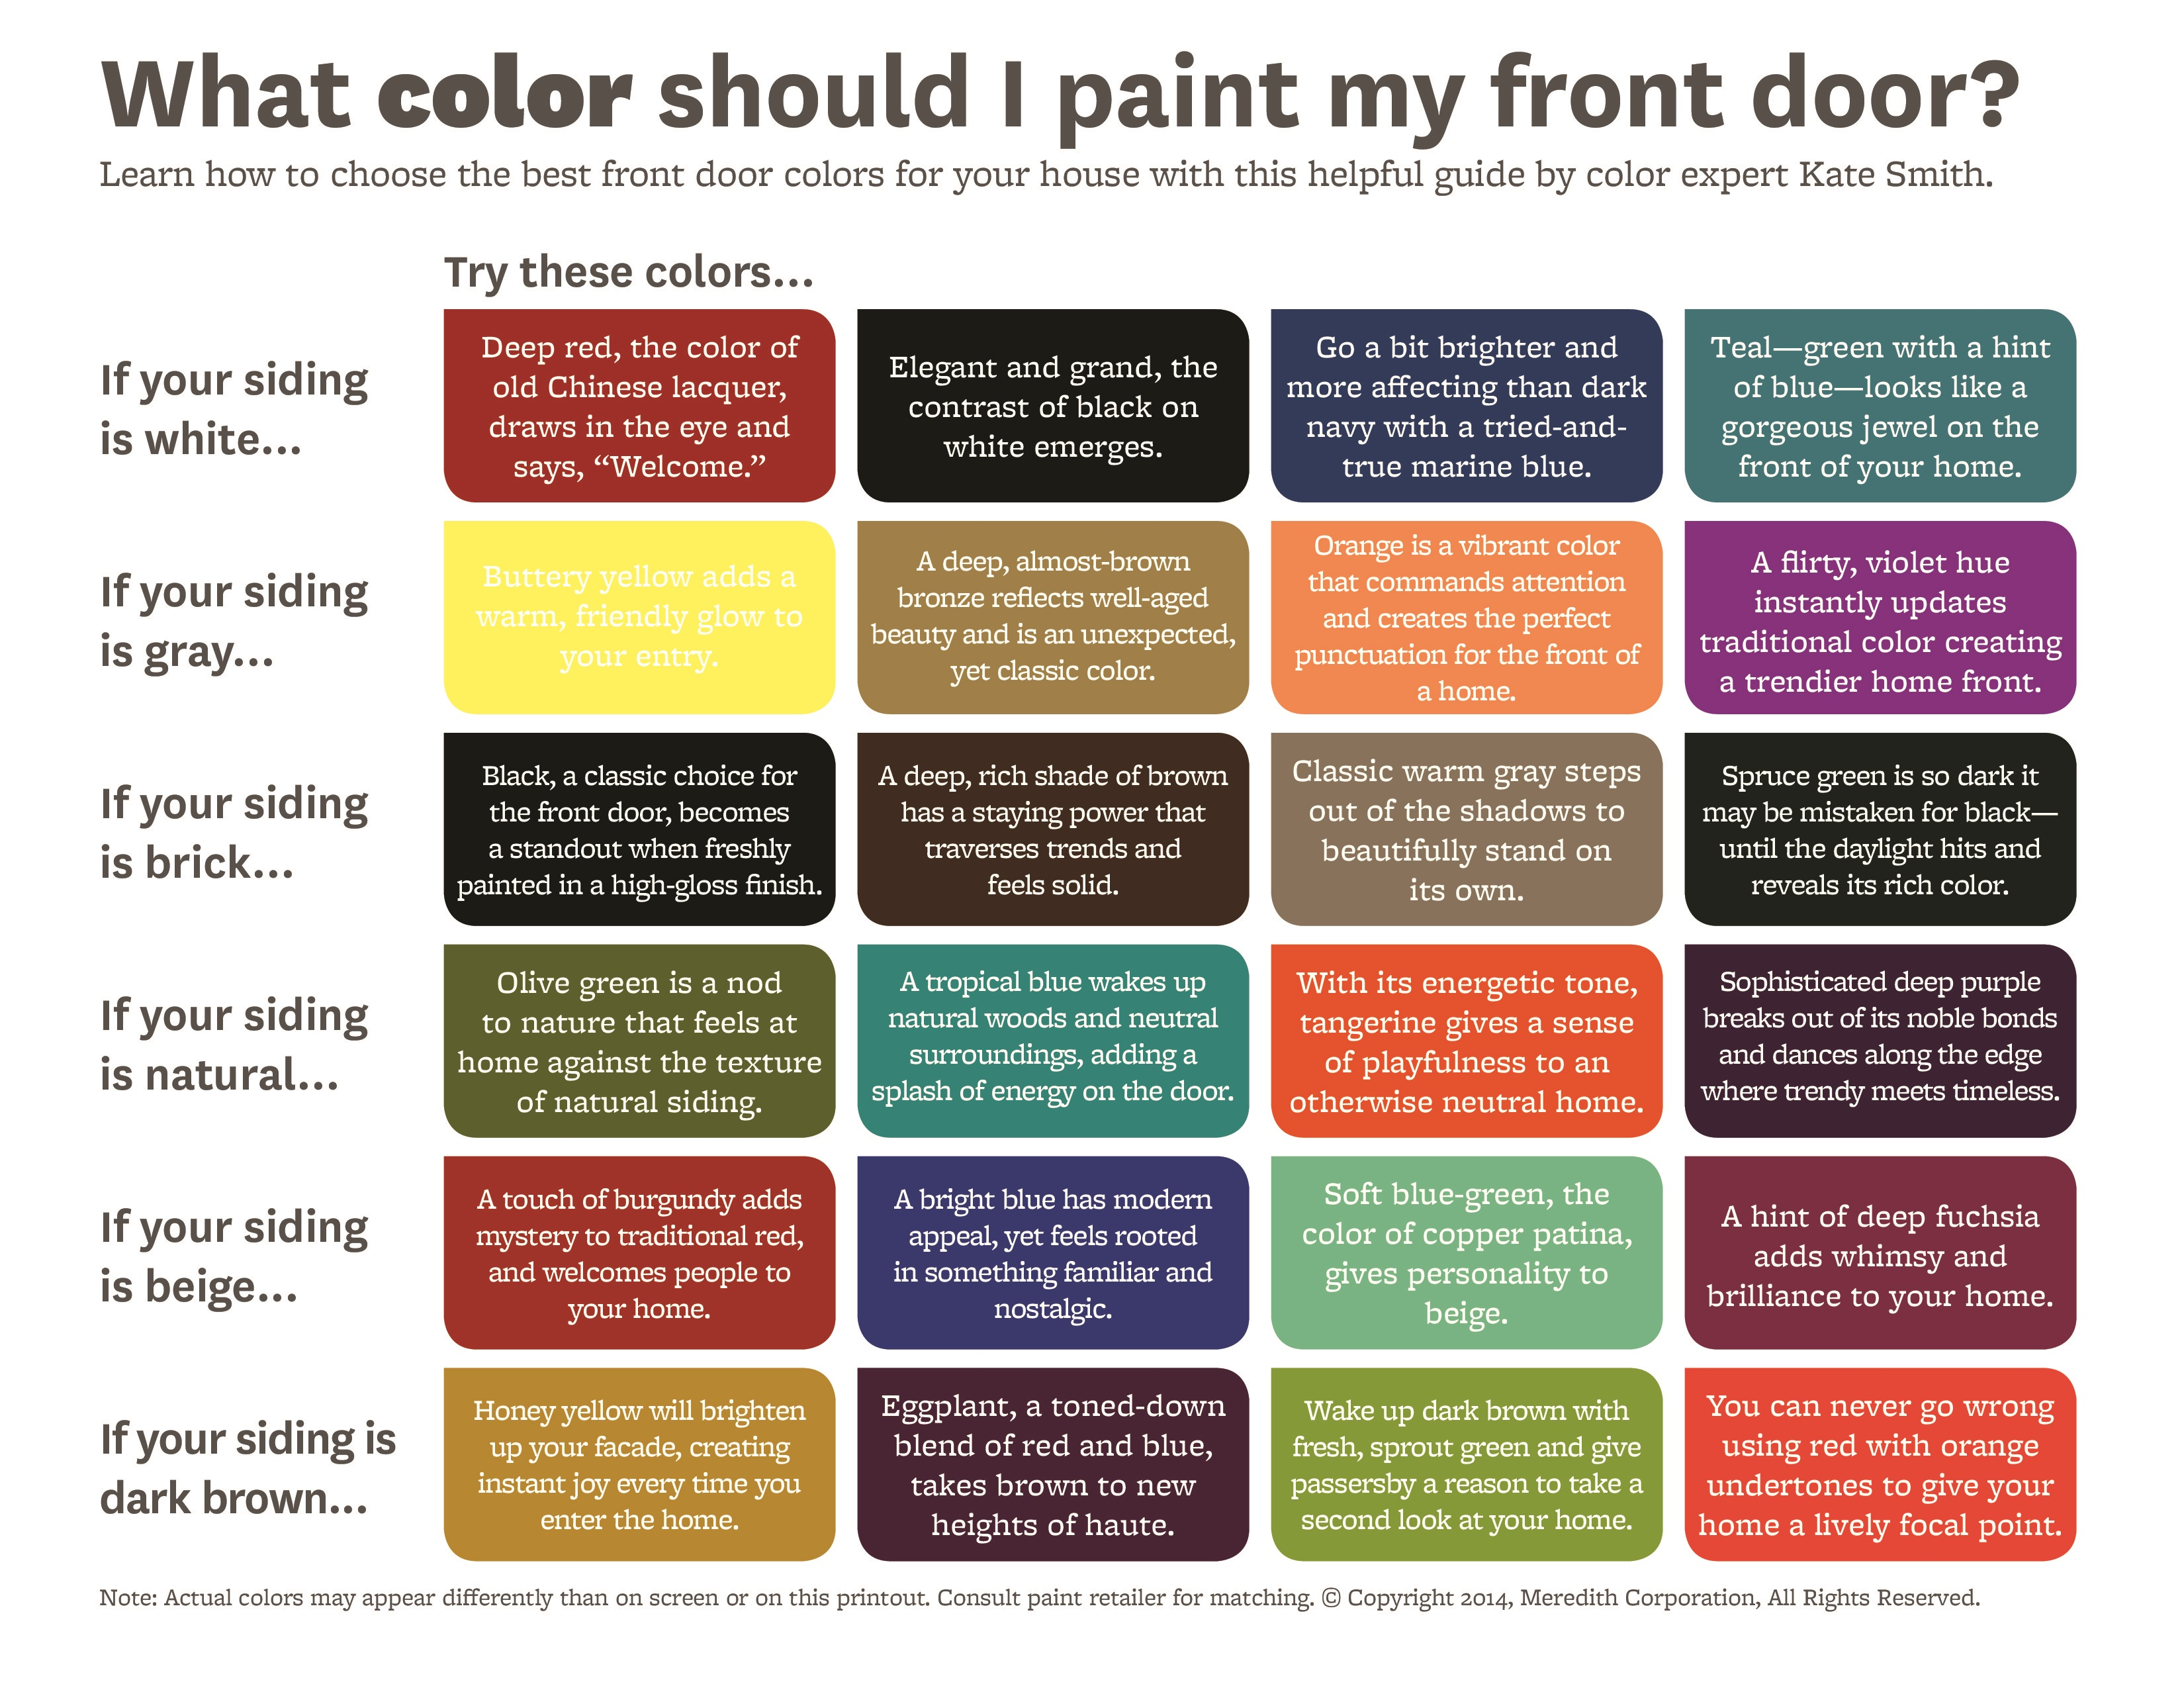 What Color Should I Paint My Front Door what color should interior doors be painted gallery - glass door